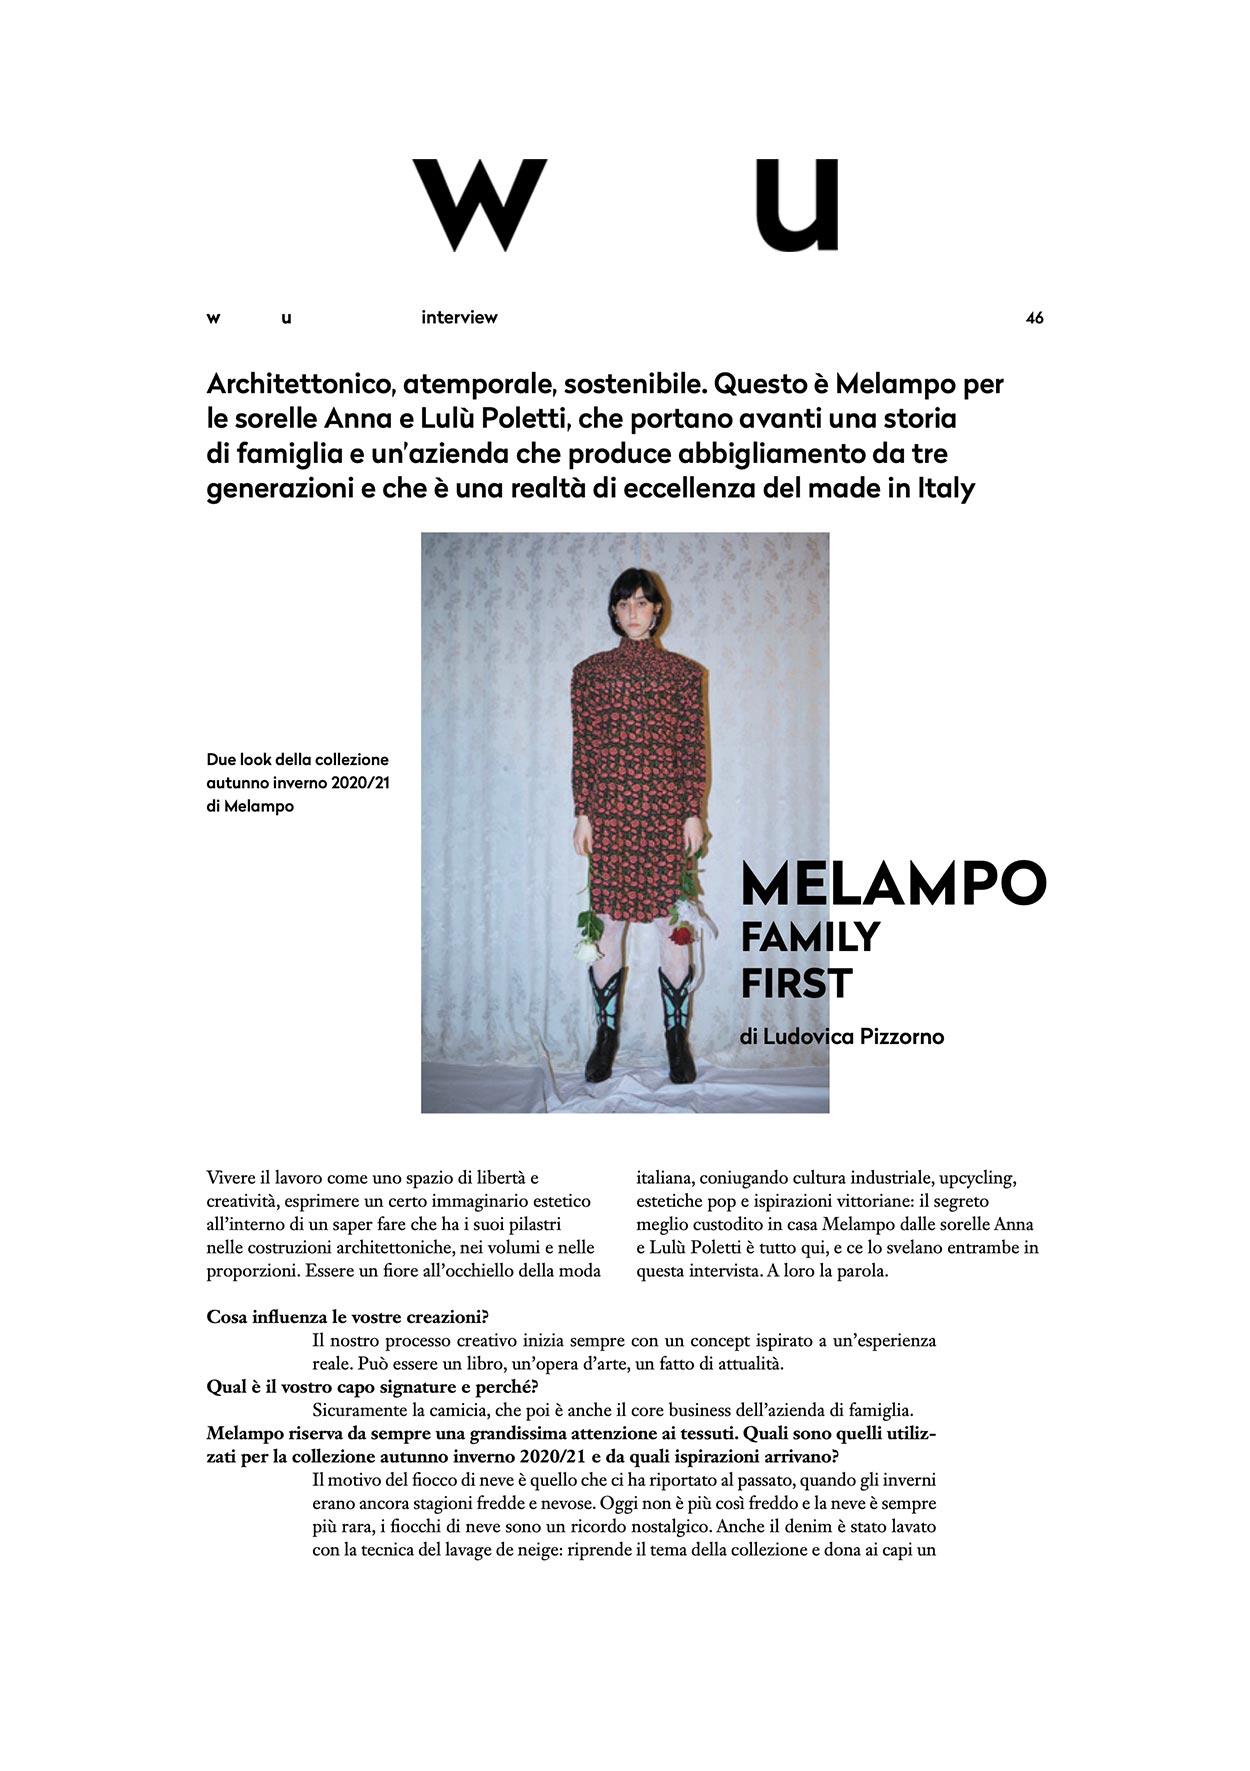 melampo interview on wu magazine - photo 1